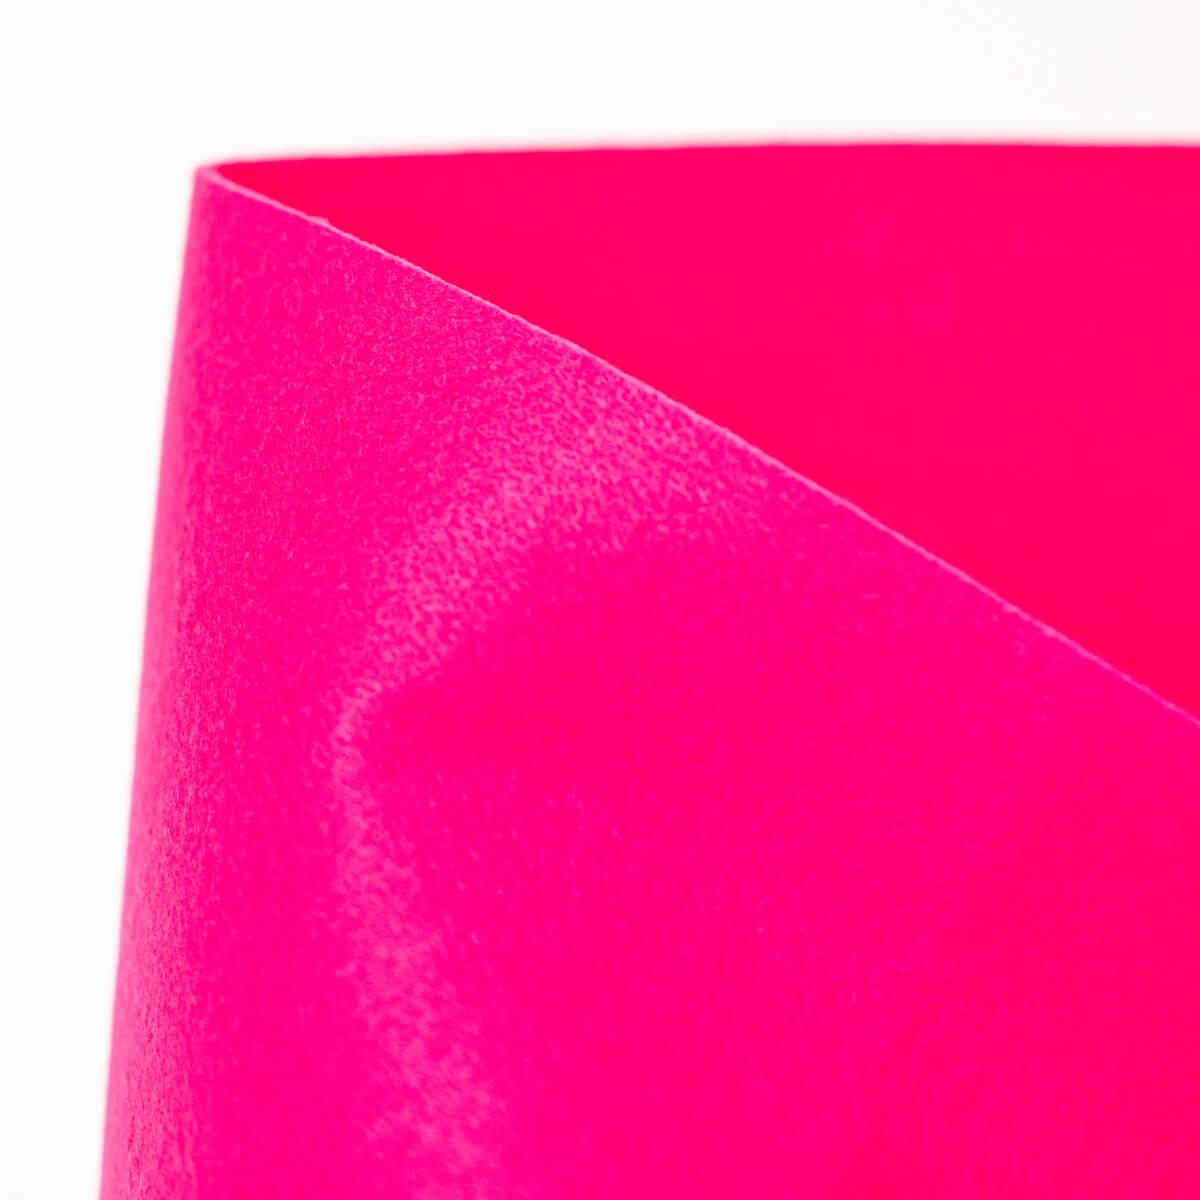 SULKY FELTY, waschbar, 25cm x 3m - Farbe 432 neon pink